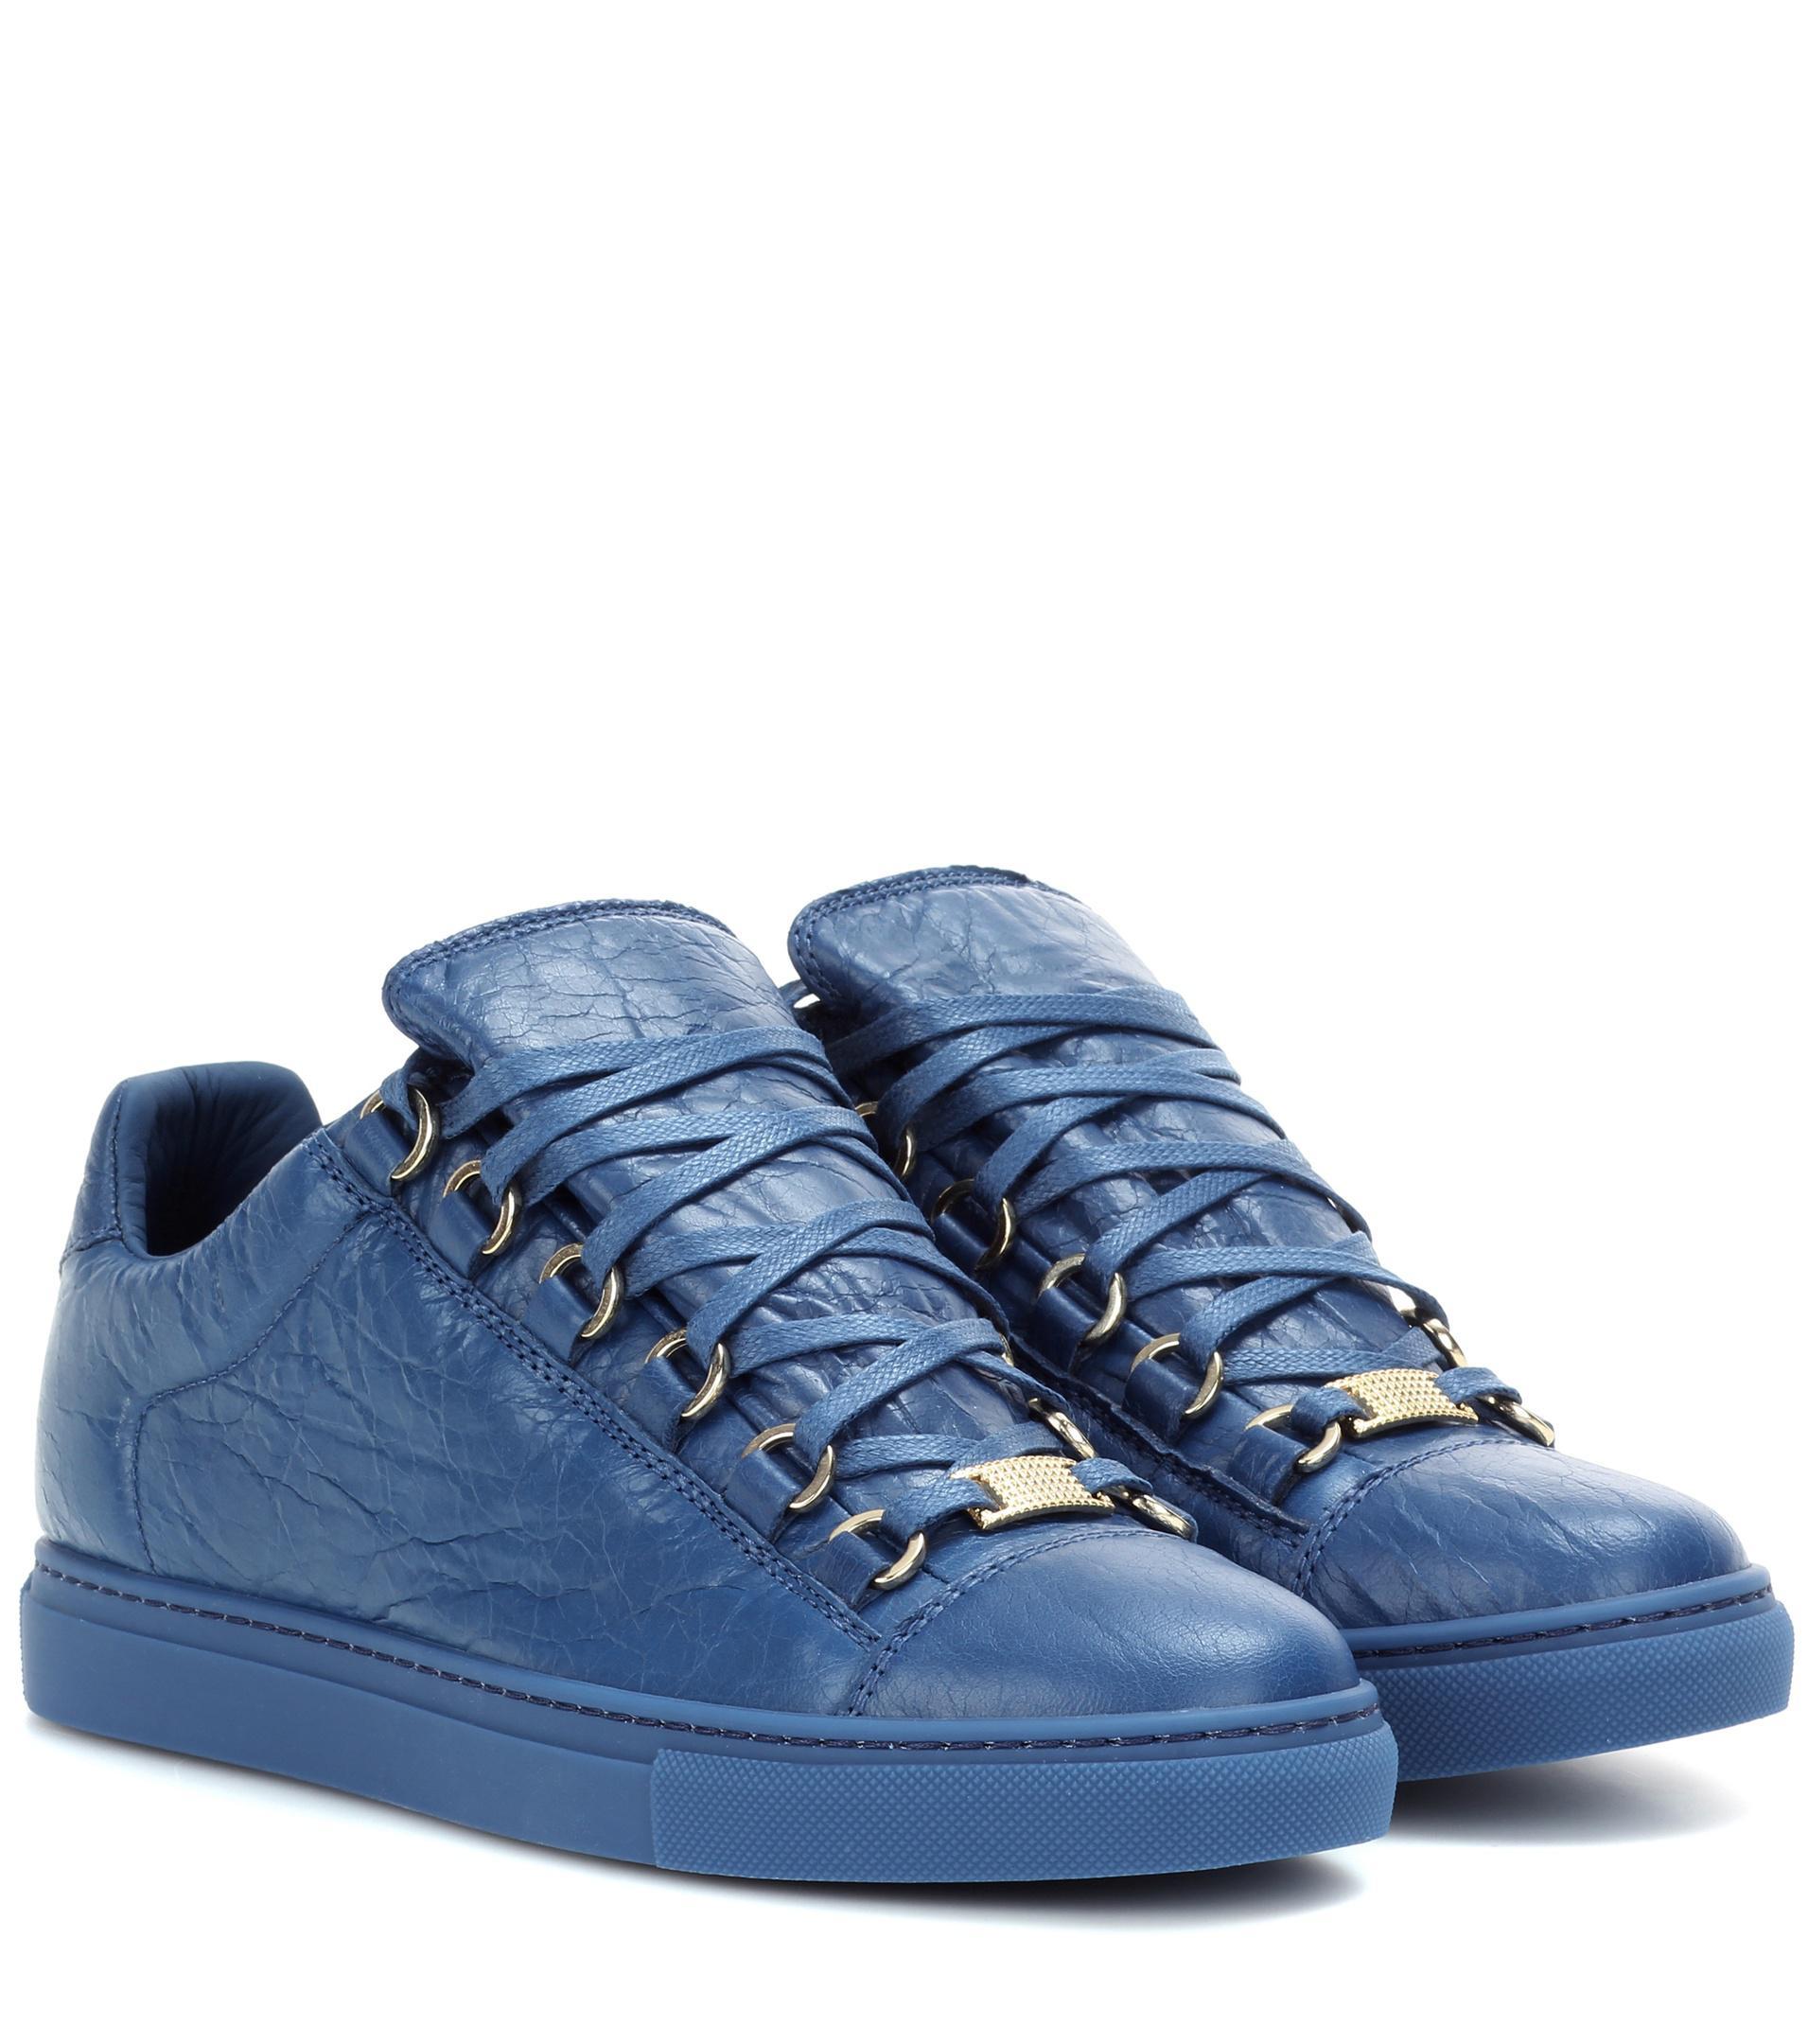 Balenciaga Arena Leather Sneakers in